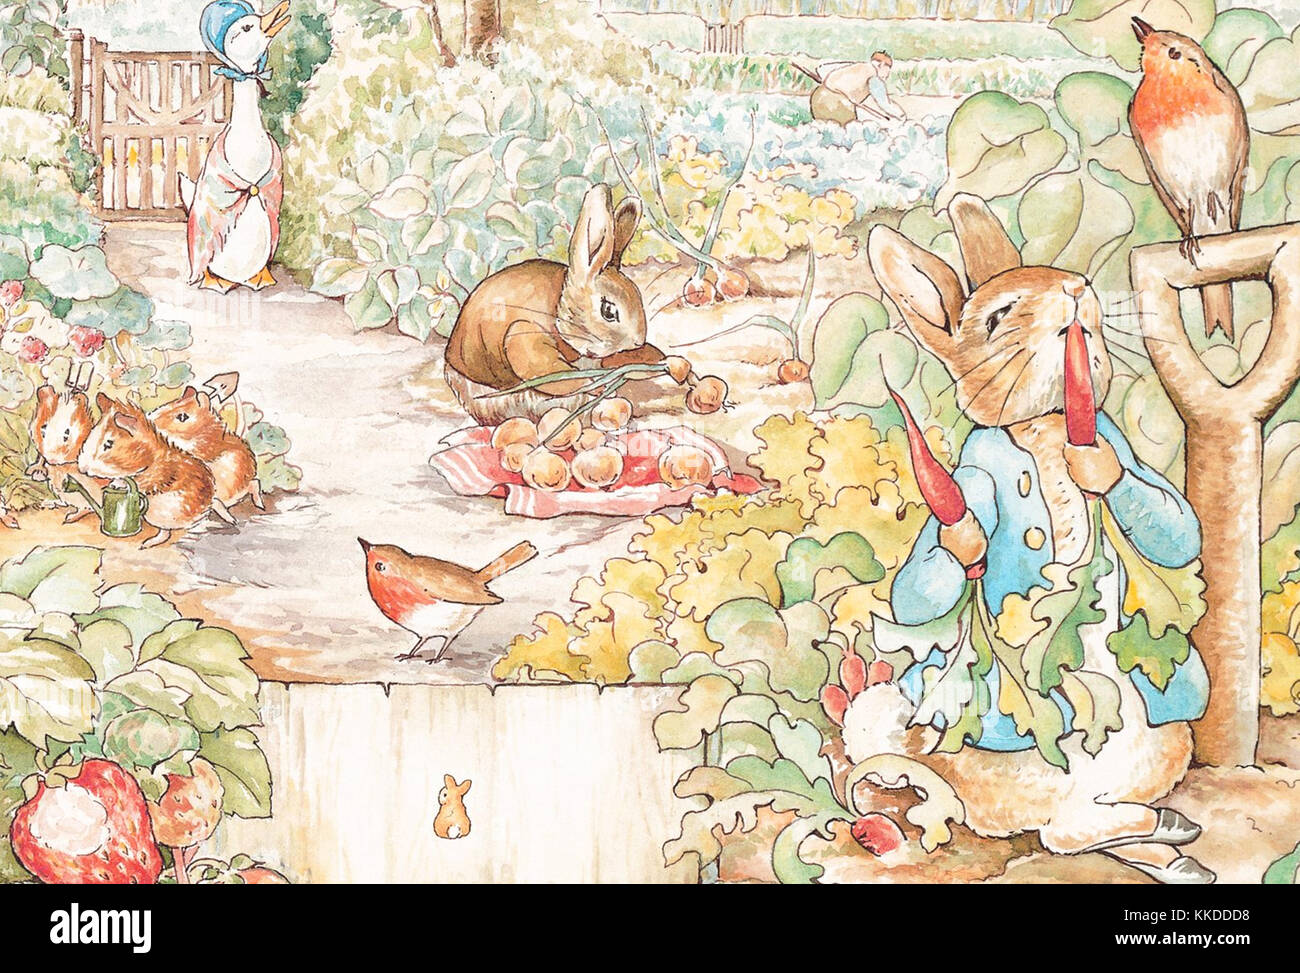 a vintage Beatrix Potter animal illustration - Stock Image